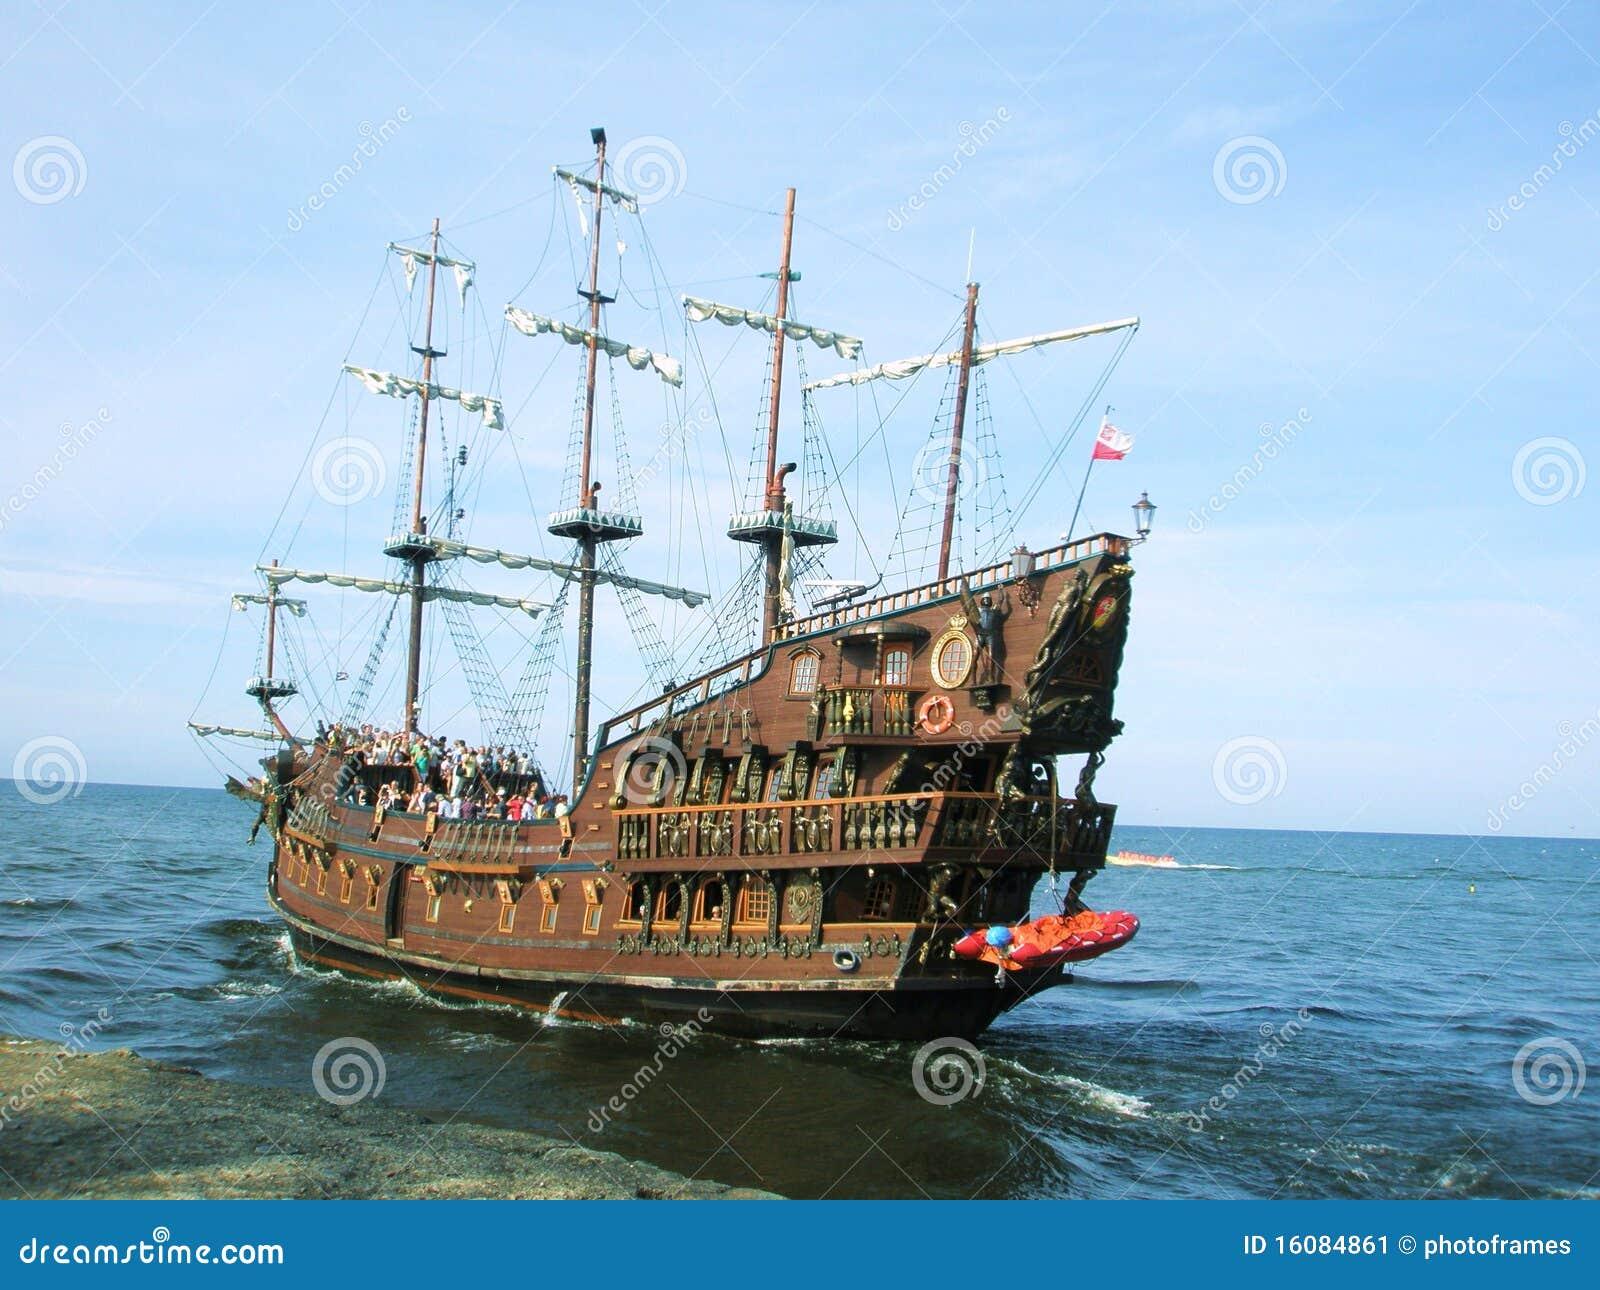 Summer pirate cruise ship